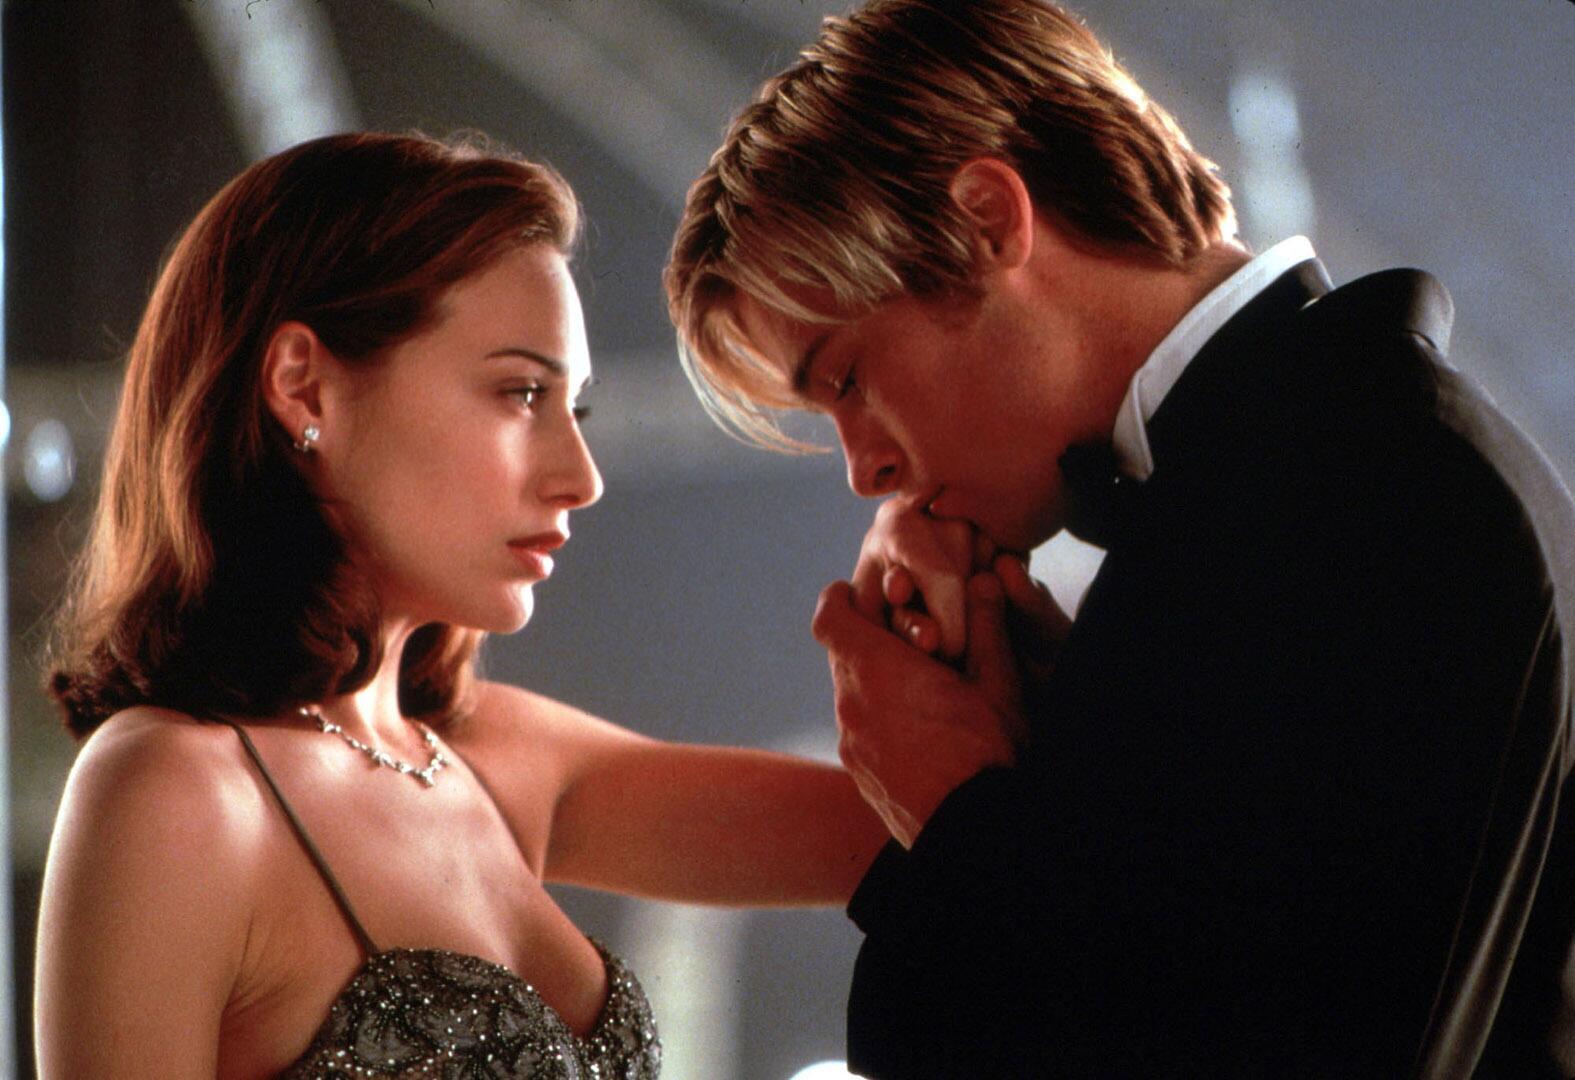 Bild zu Brad Pitt, Freundin, Claire Forlani